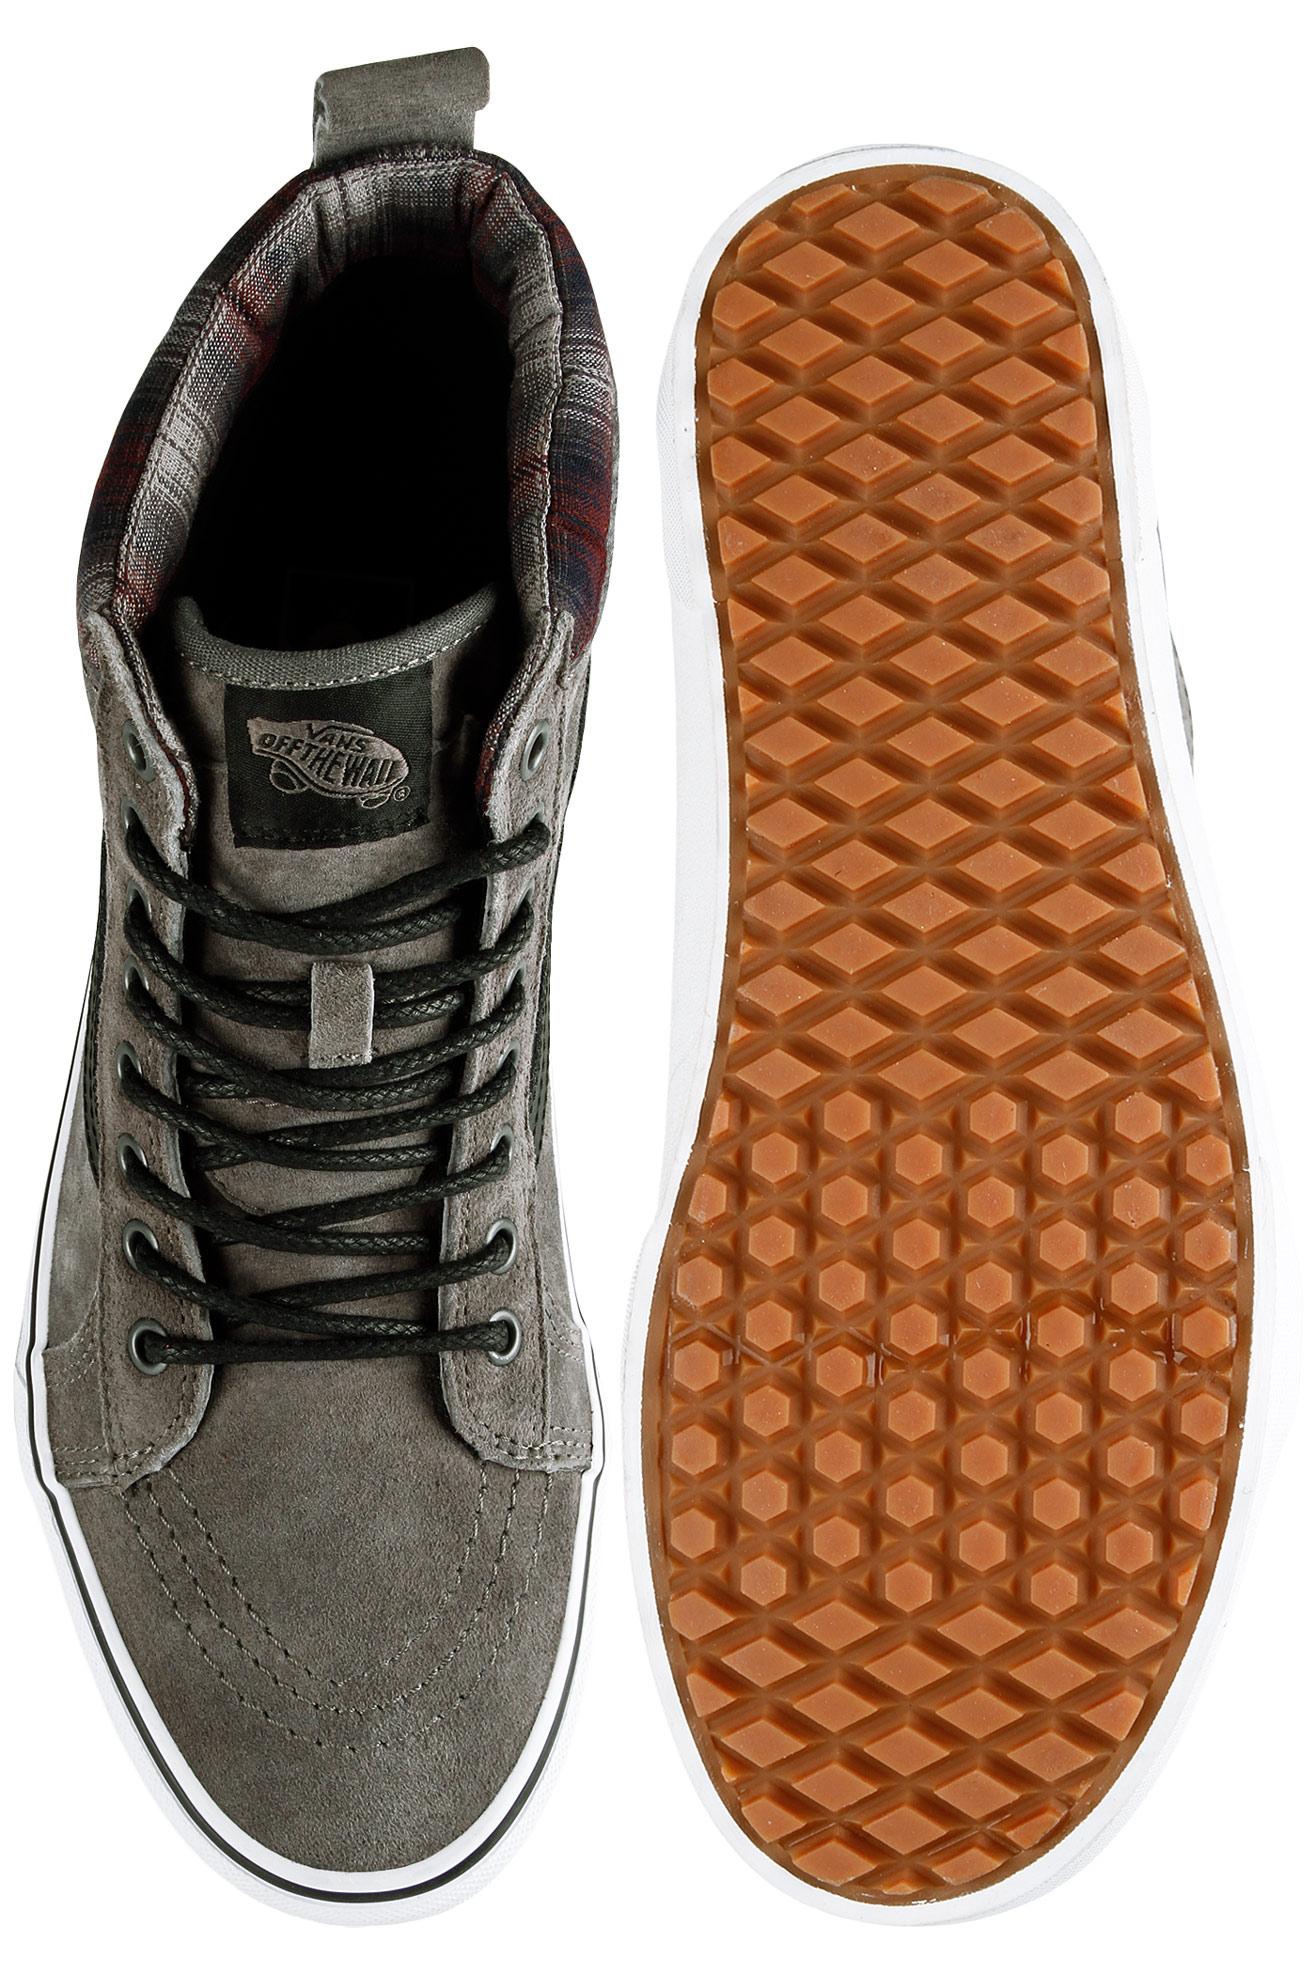 Vans Sk Hi Mte Pewter And Plaid Shoes